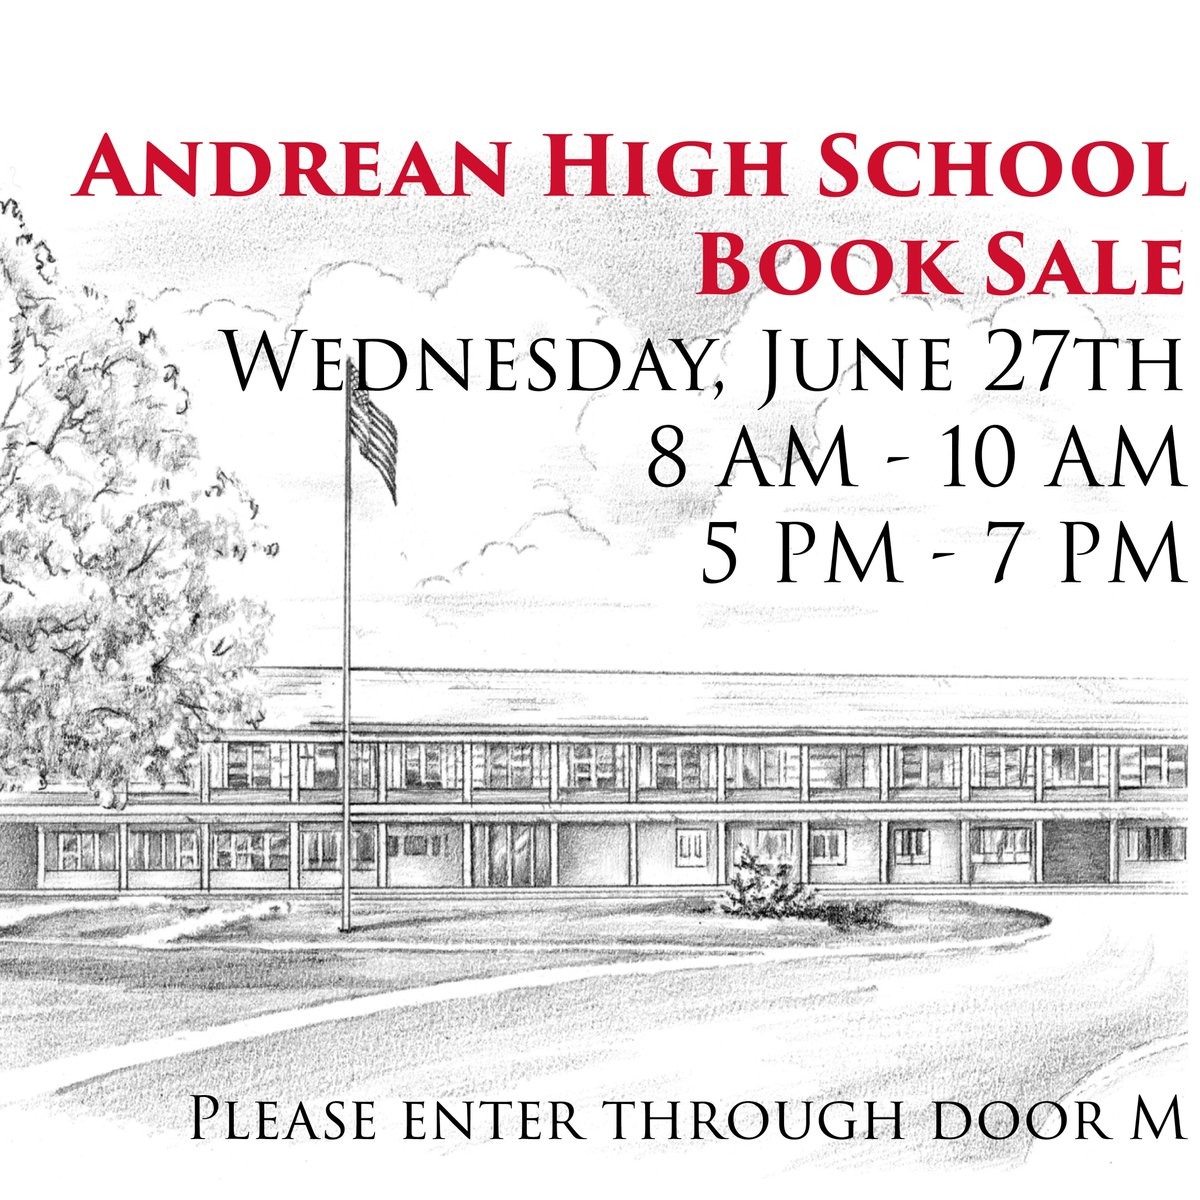 Andrean High School on Twitter: